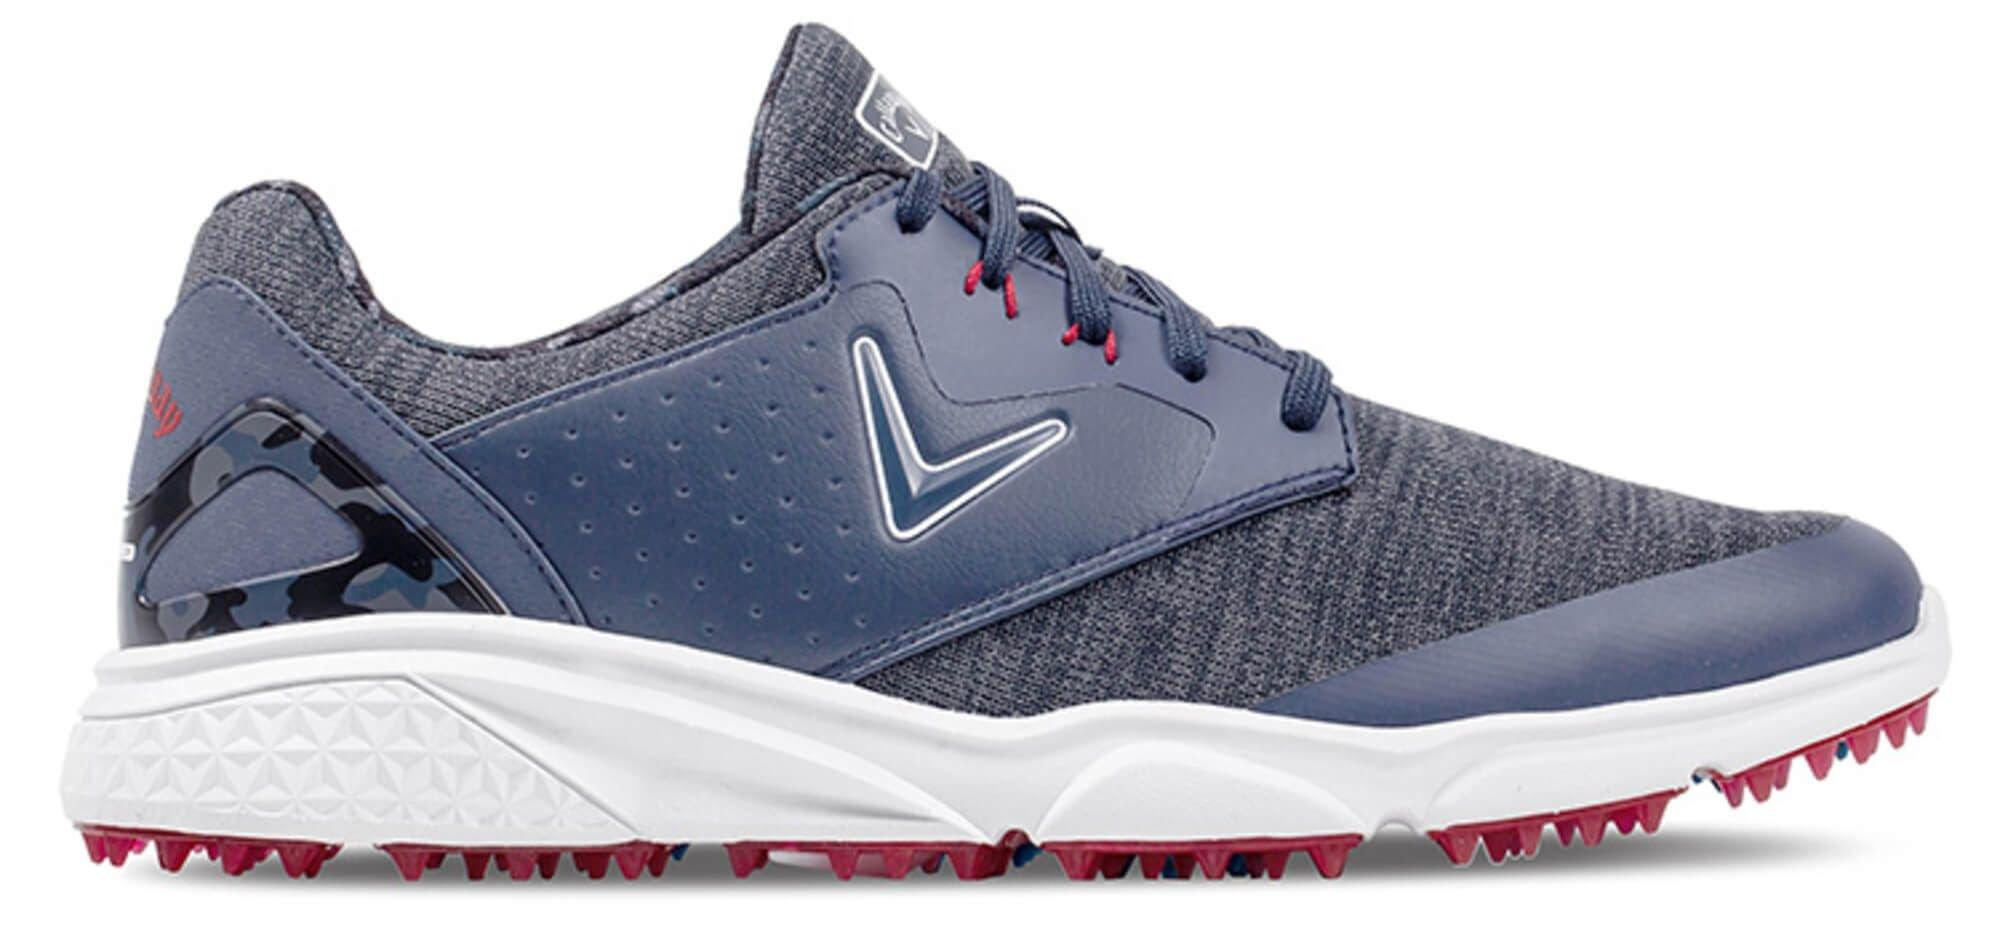 Callaway Coronado V2 SL Golf Shoes 2021 Navy - Carl's Golfland